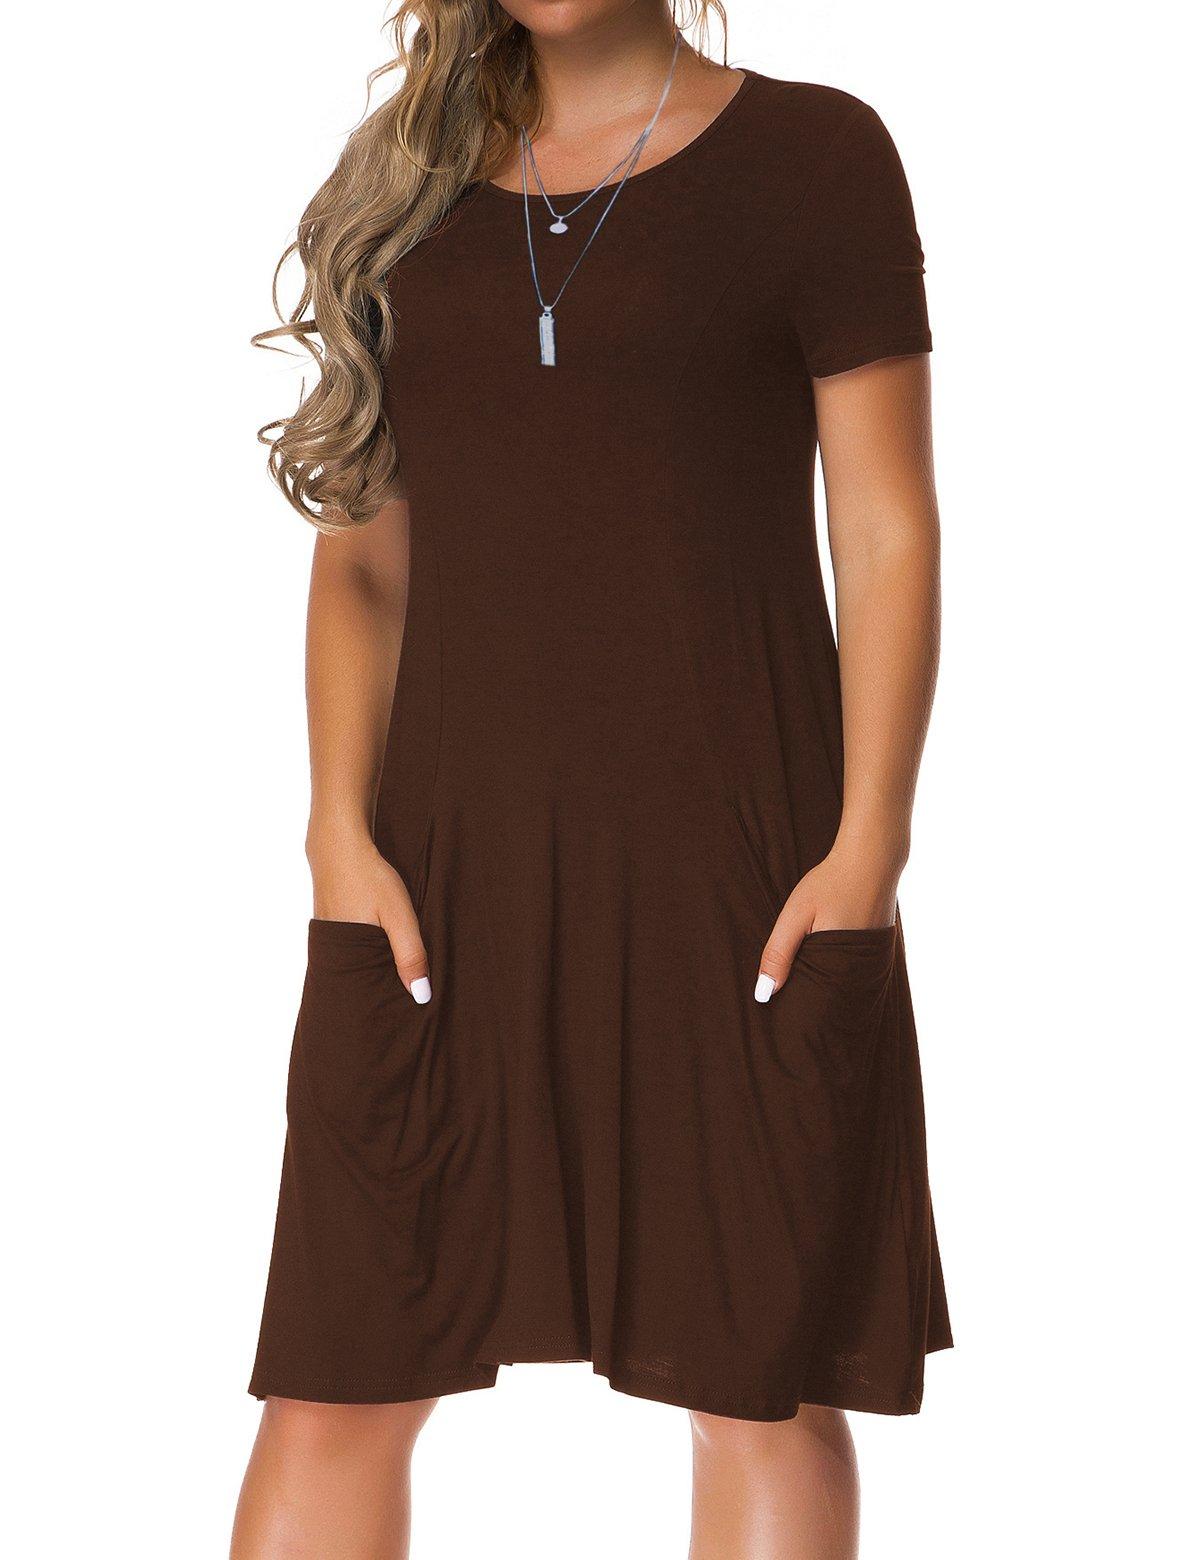 VERABENDI Women's Short Sleeve Dress Casual Loose Pocket T-Shirt Dress Coffee 2XL